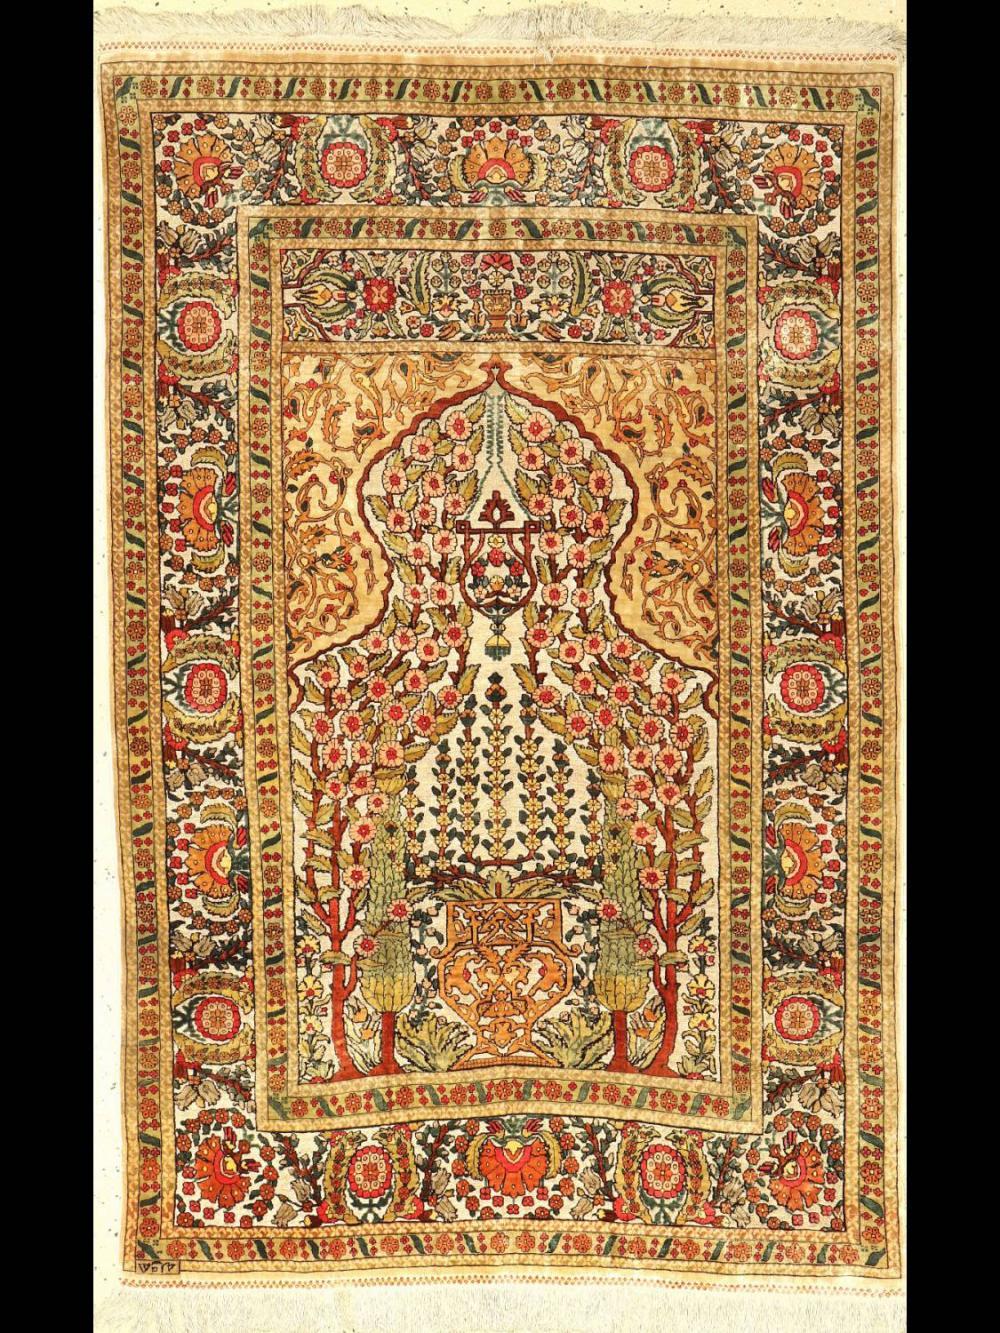 Fine signed silk Hereke, Turkey, around 1950, pure natural